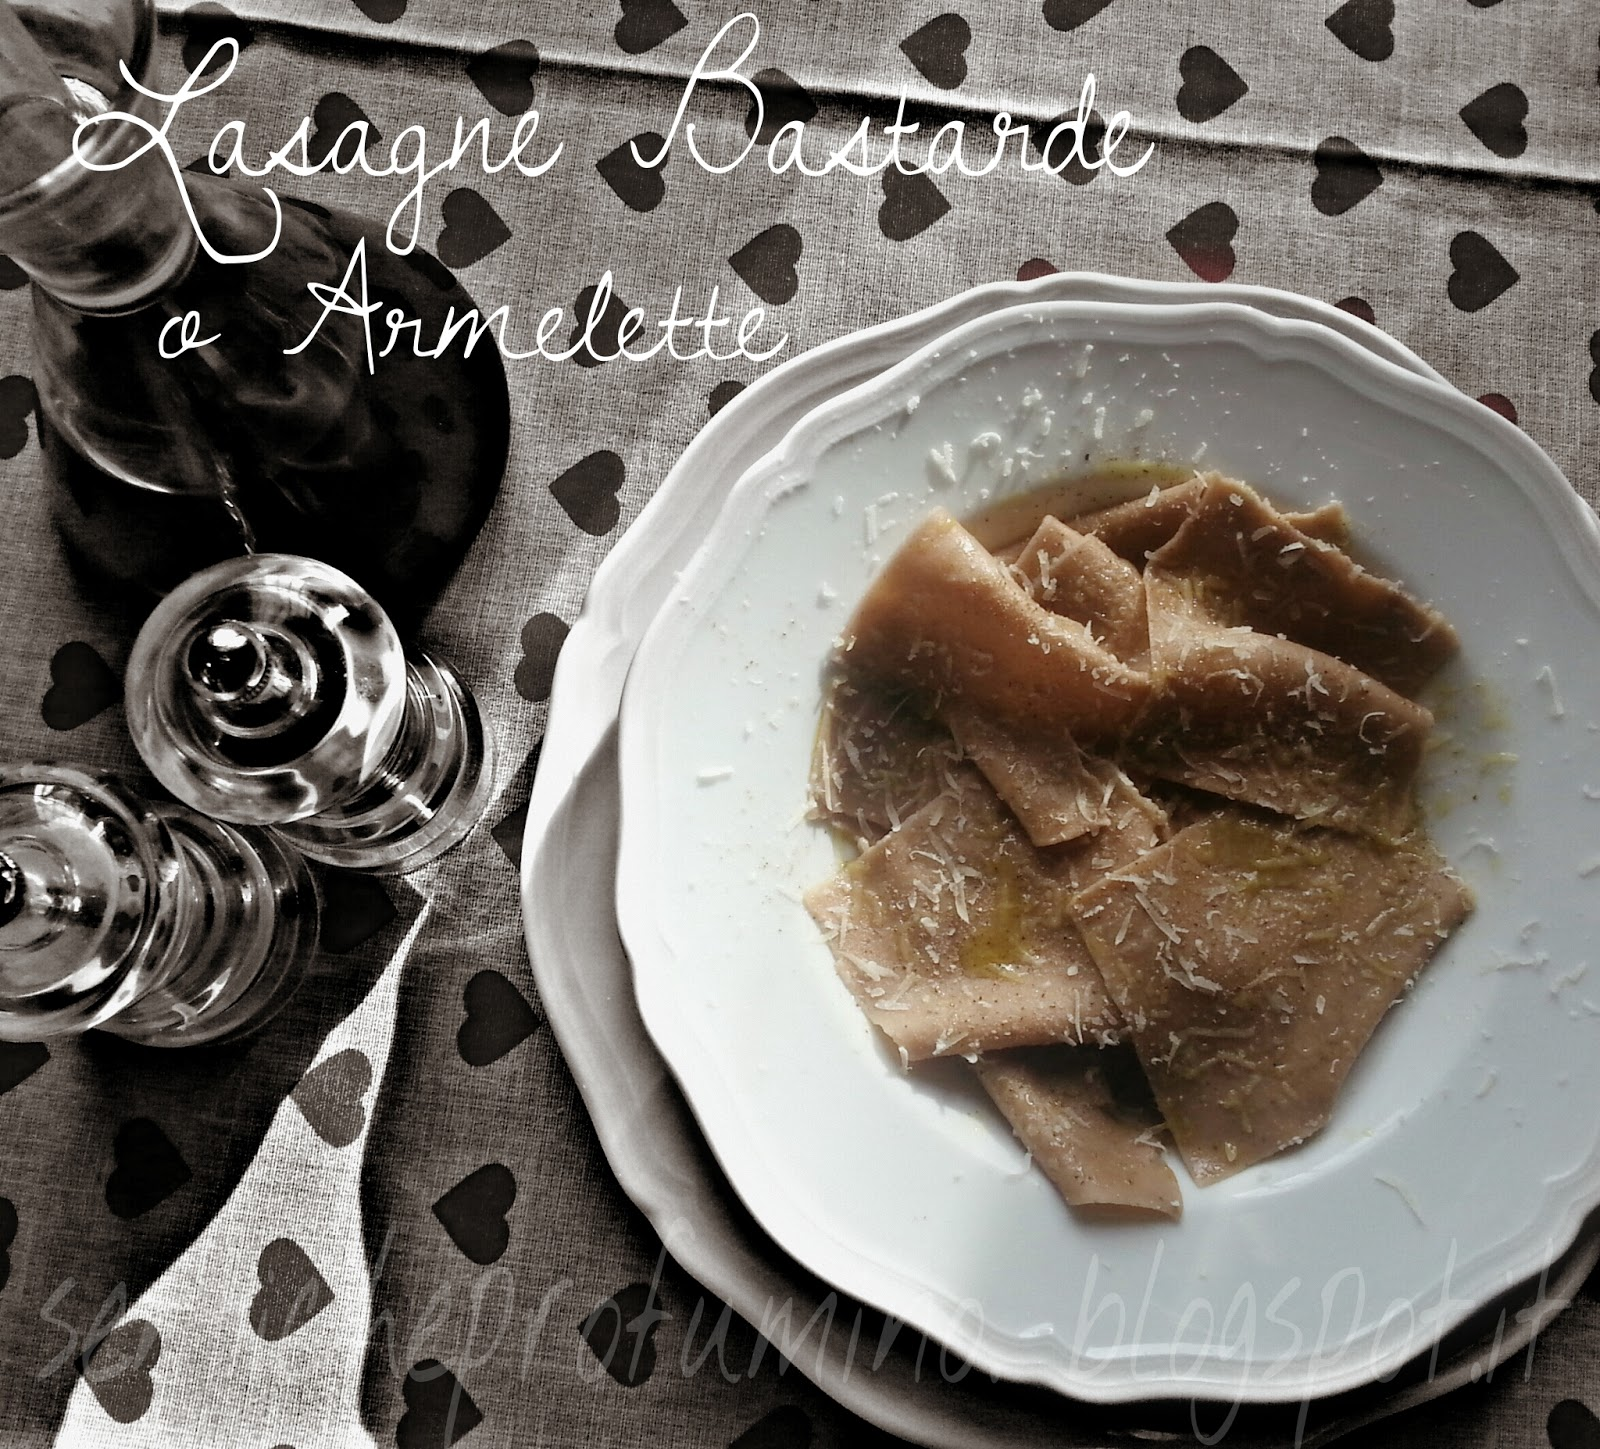 Lasagne Bastarde o Armelette, Cucina tradizionale Toscana